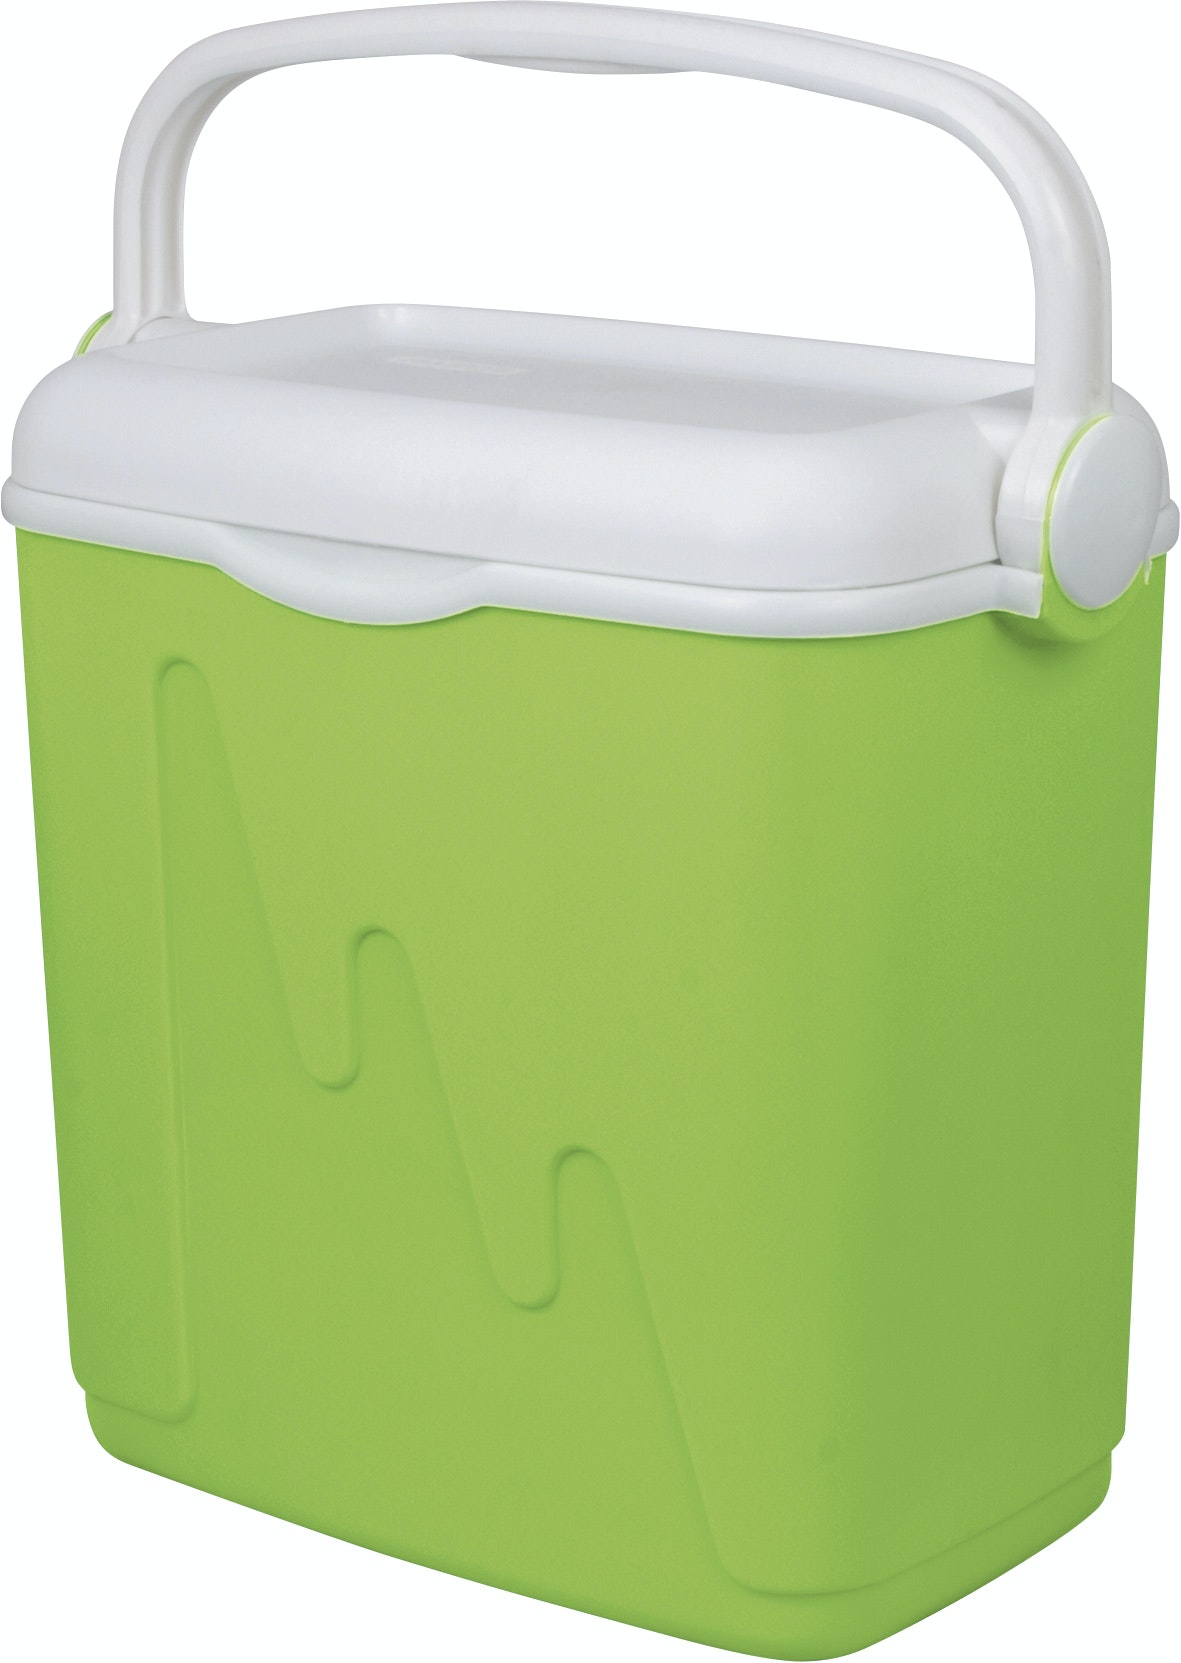 Kylväska Curver 20L Lime